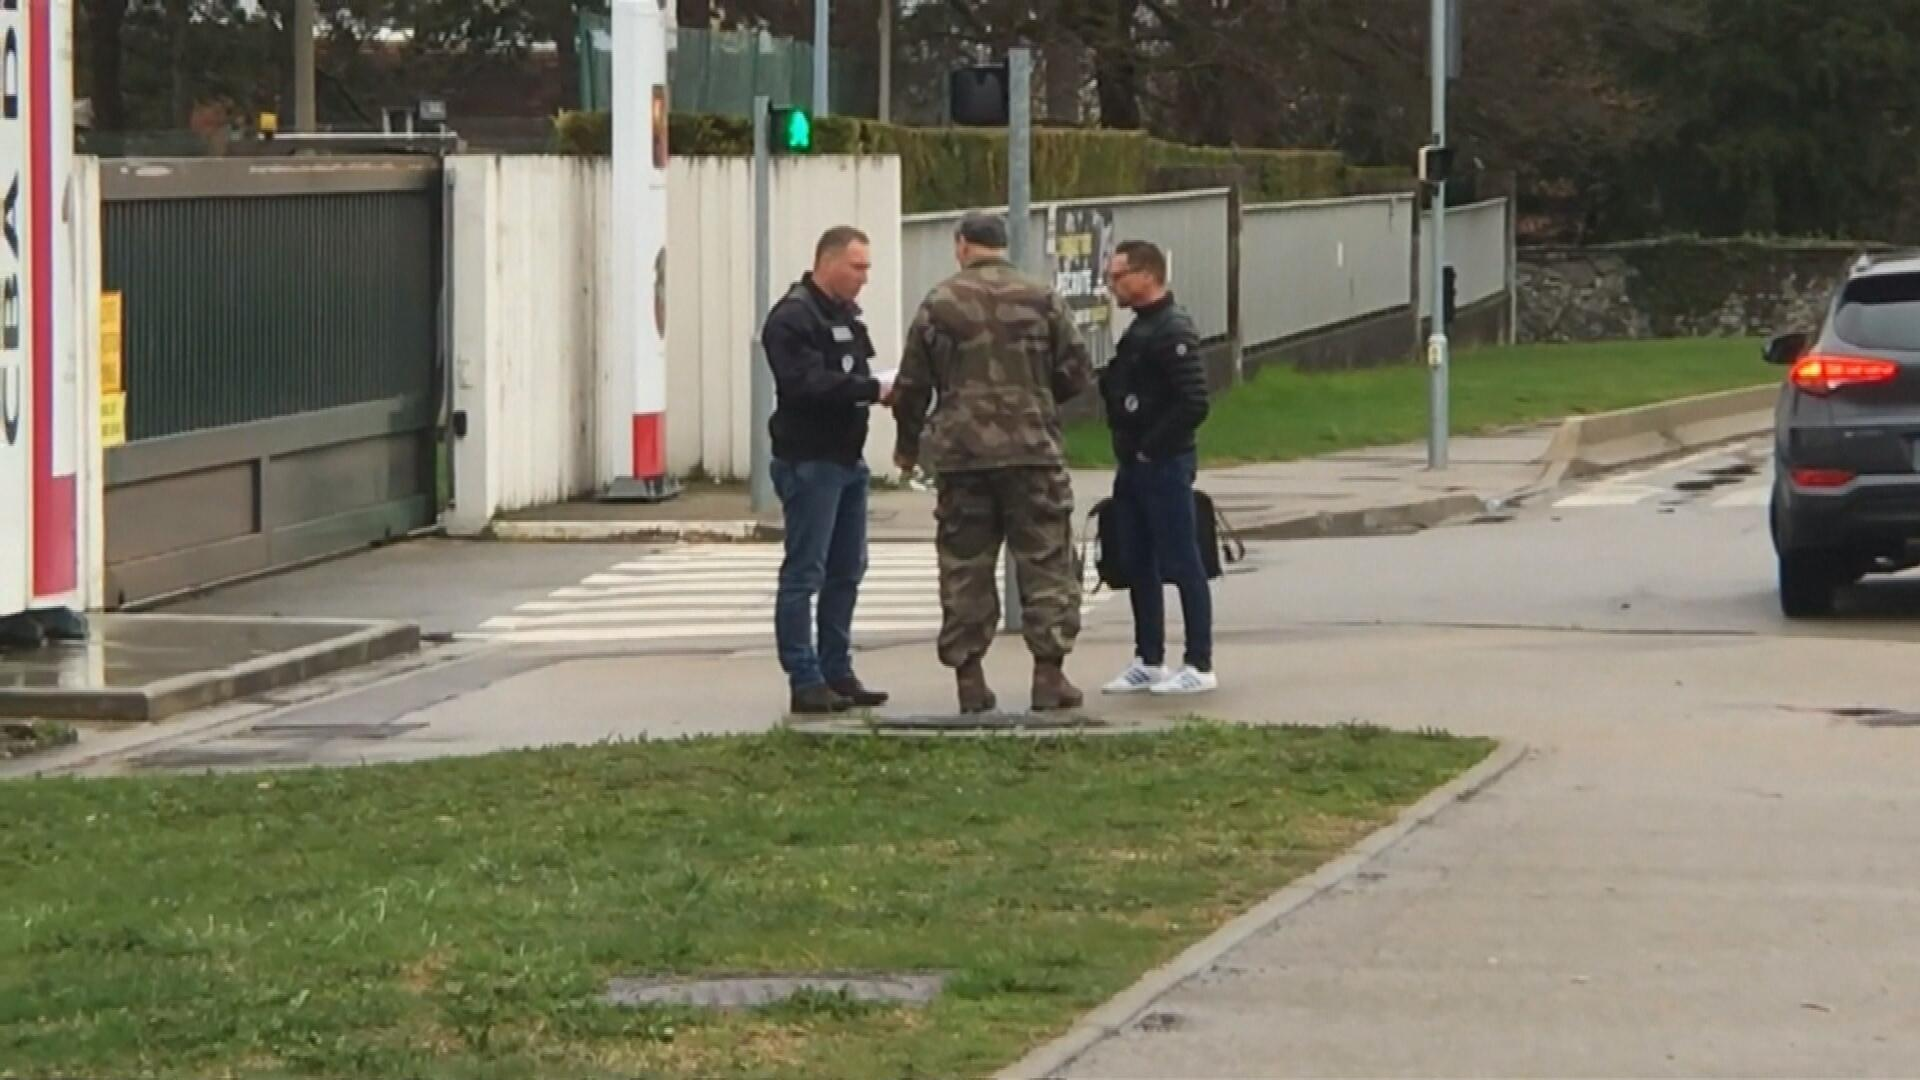 Exterior de la base militar en Varces-Allieres-et-Risset, France, el 29 de marzo de 2018.